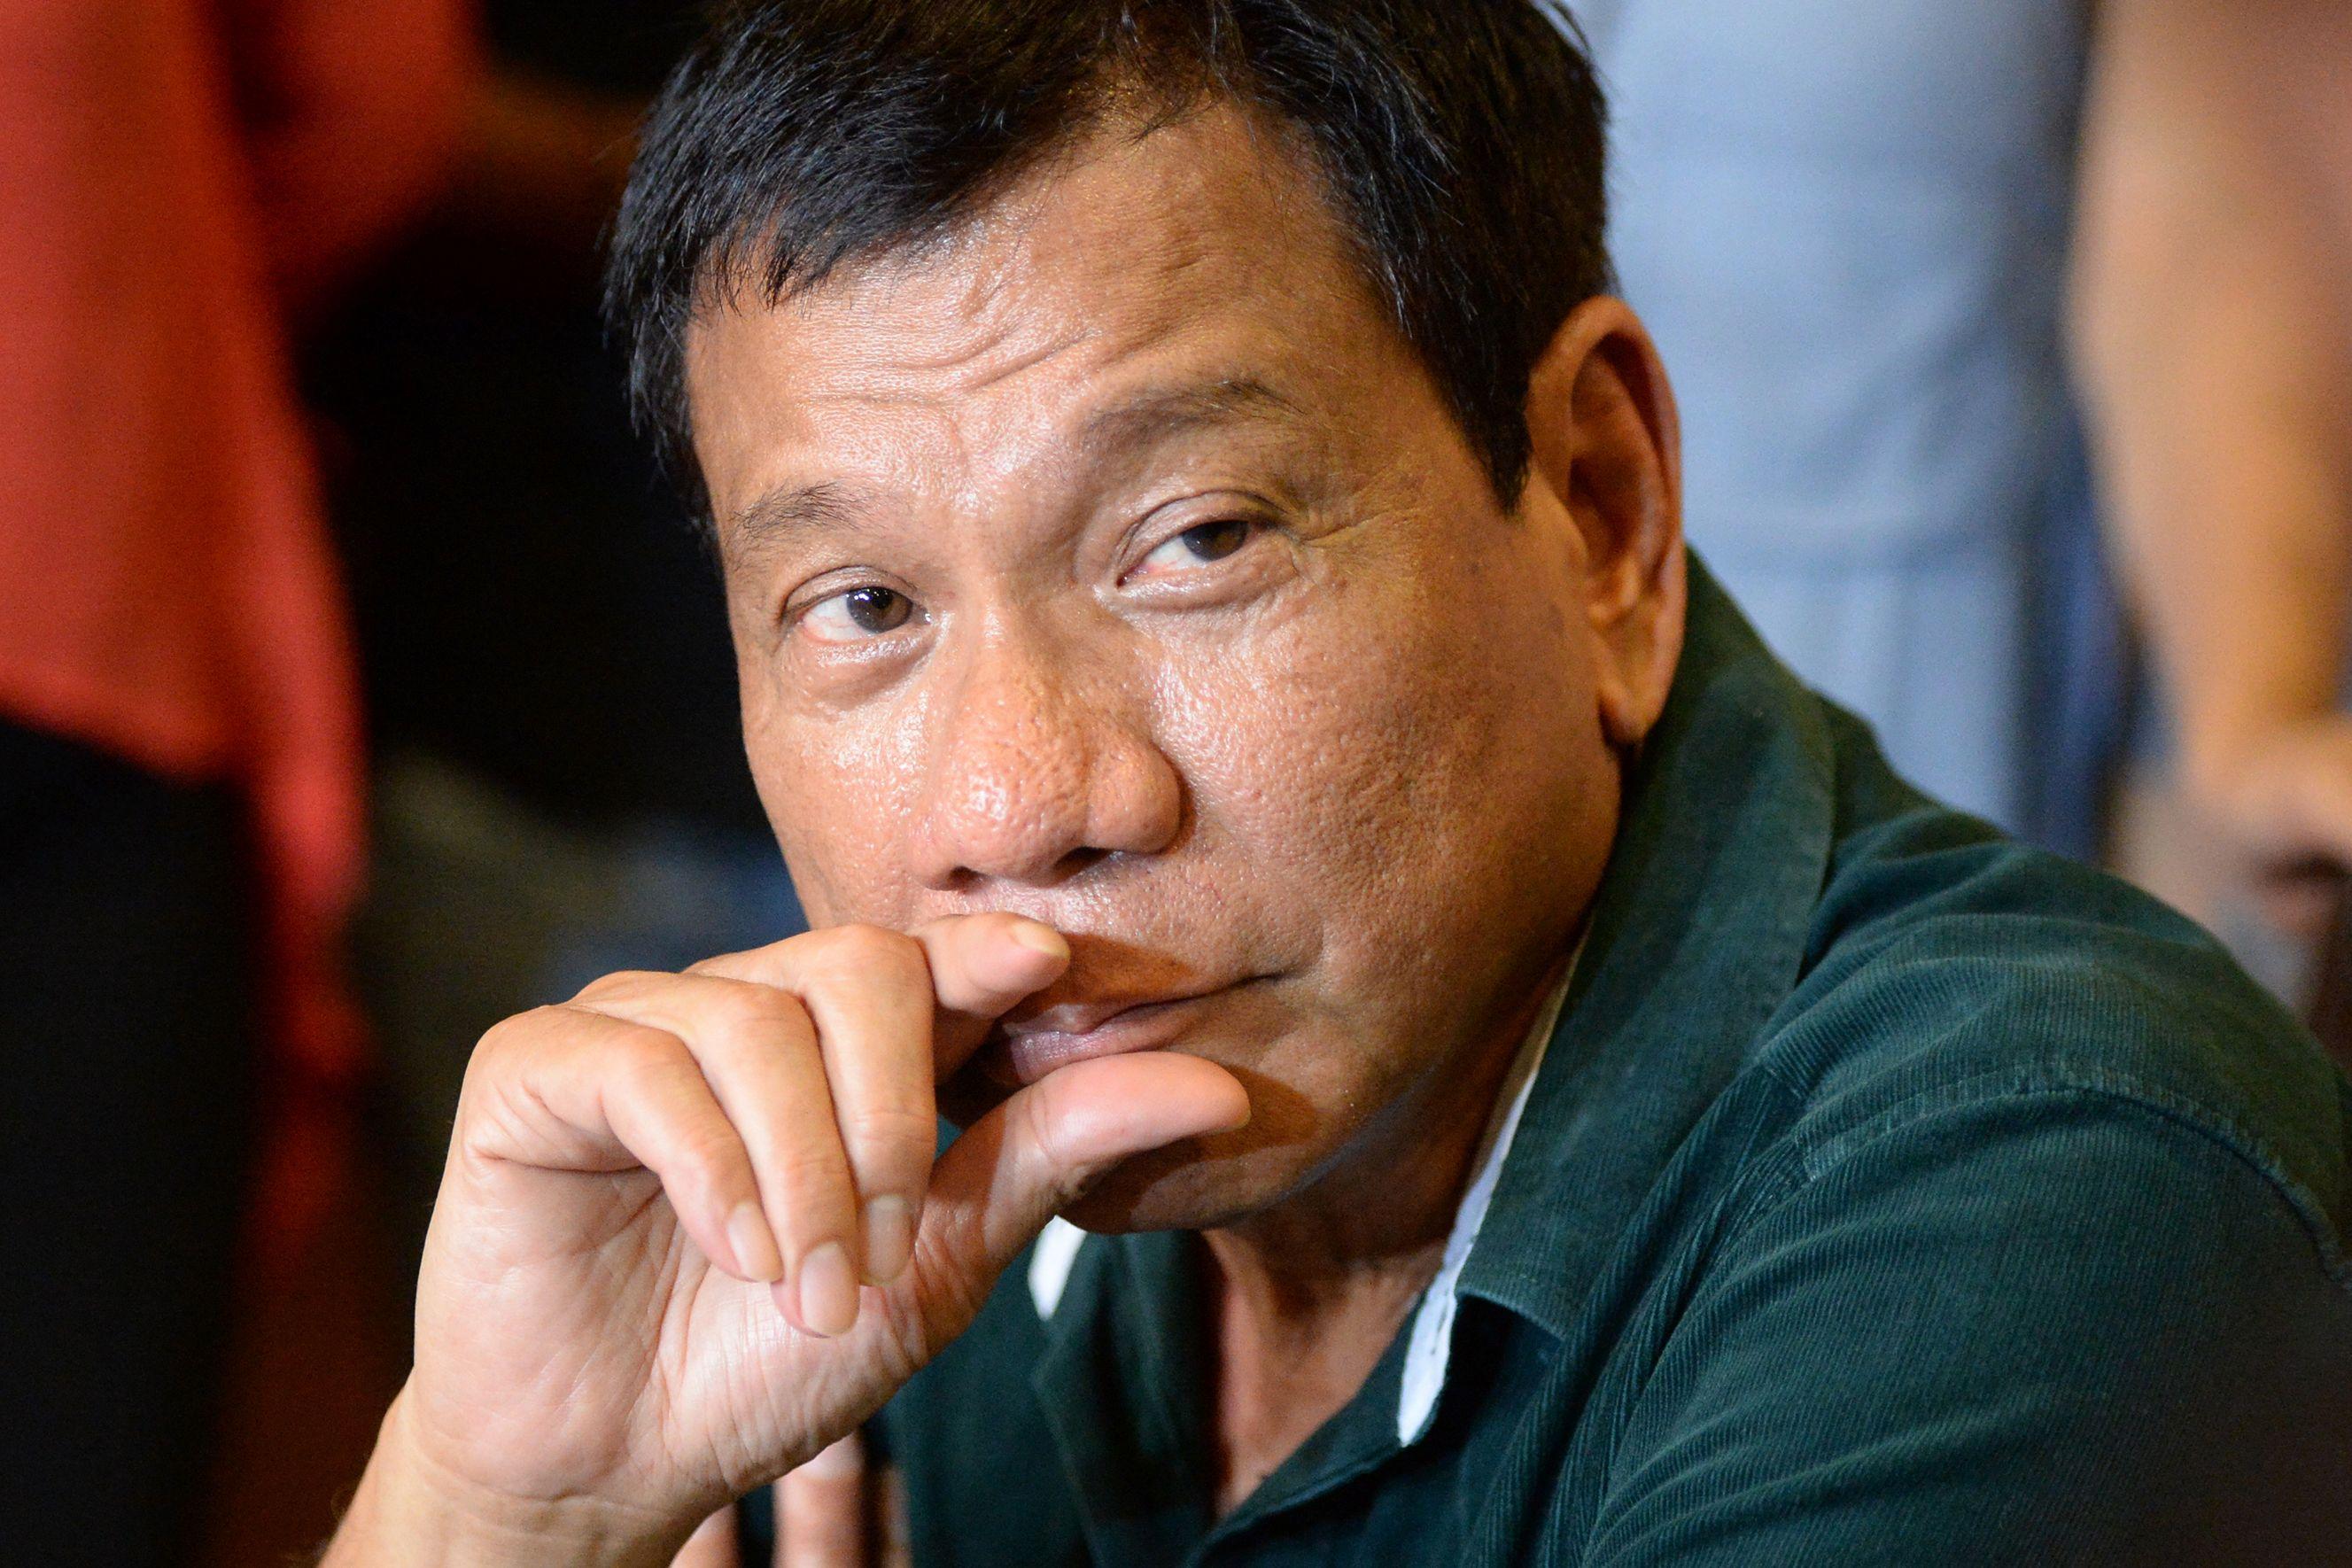 Philippine President Rodrigo Duterte in Davao City, pictured on May 15, 2016.